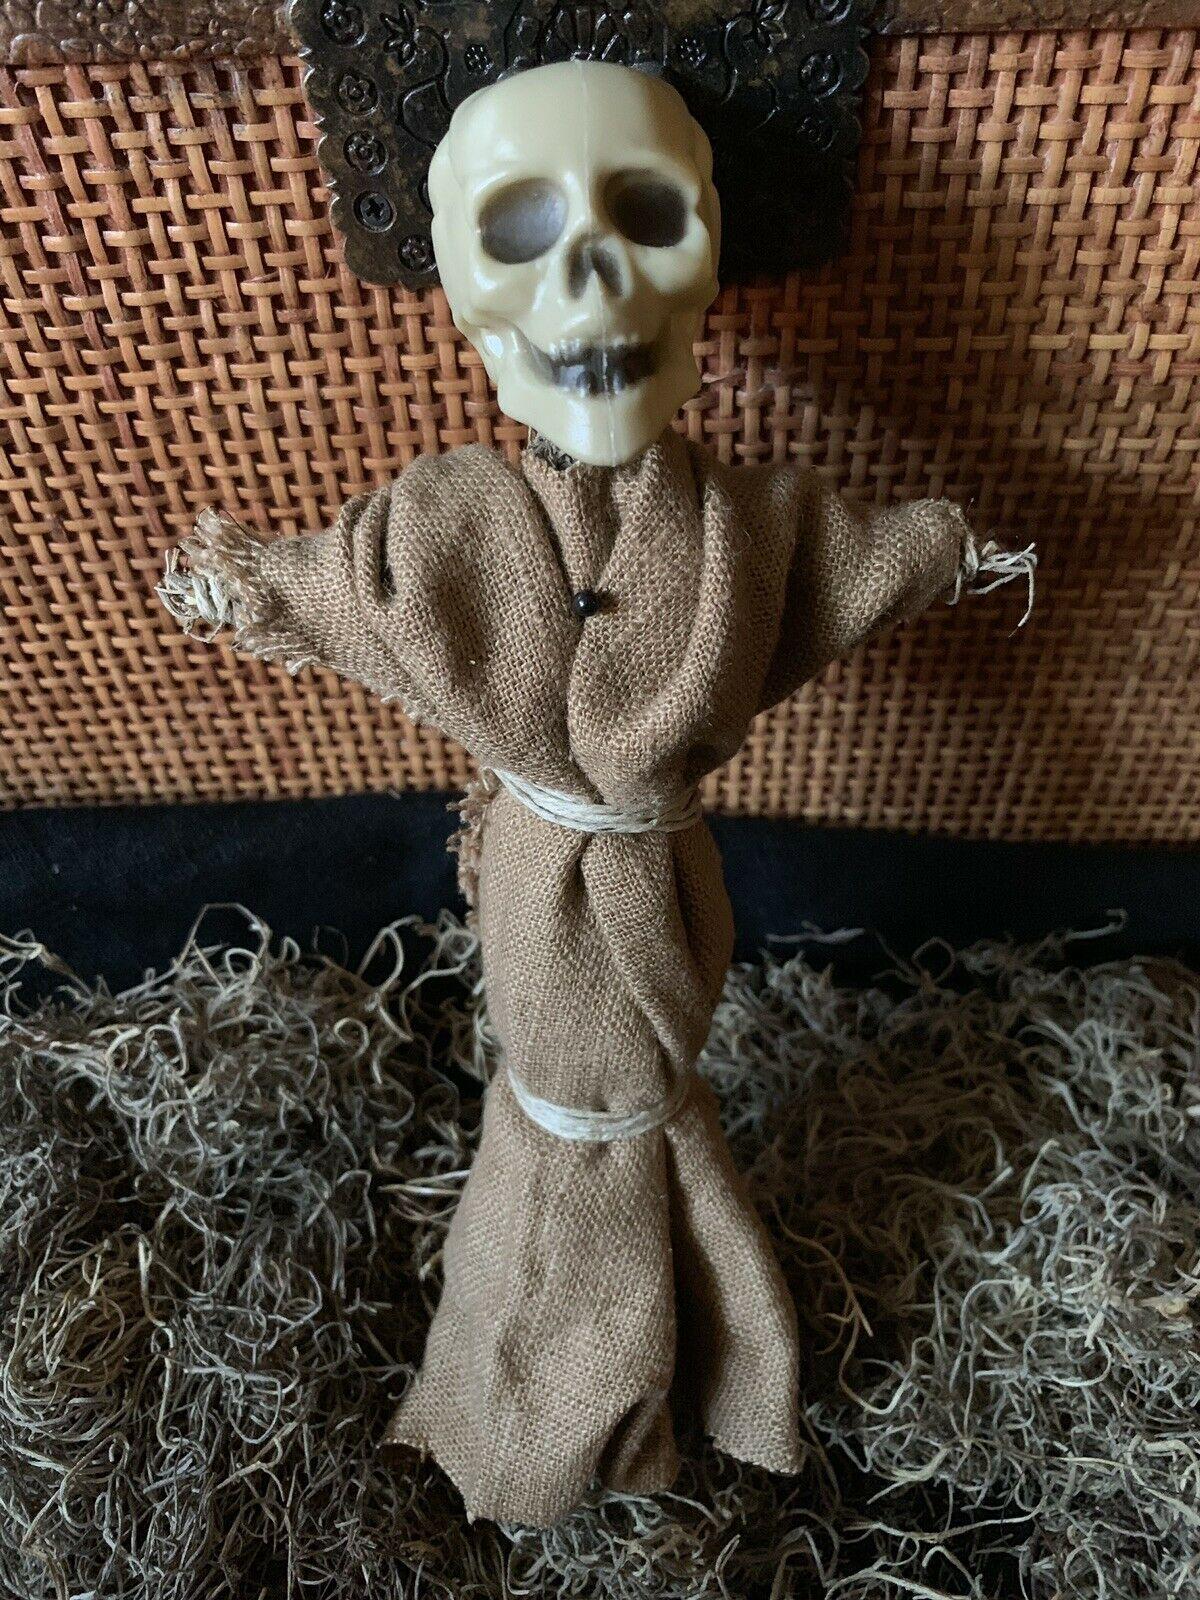 AUTHENTIC VOODOO DOLL BROWN/WITH PINS #2 | eBay | Voodoo ...